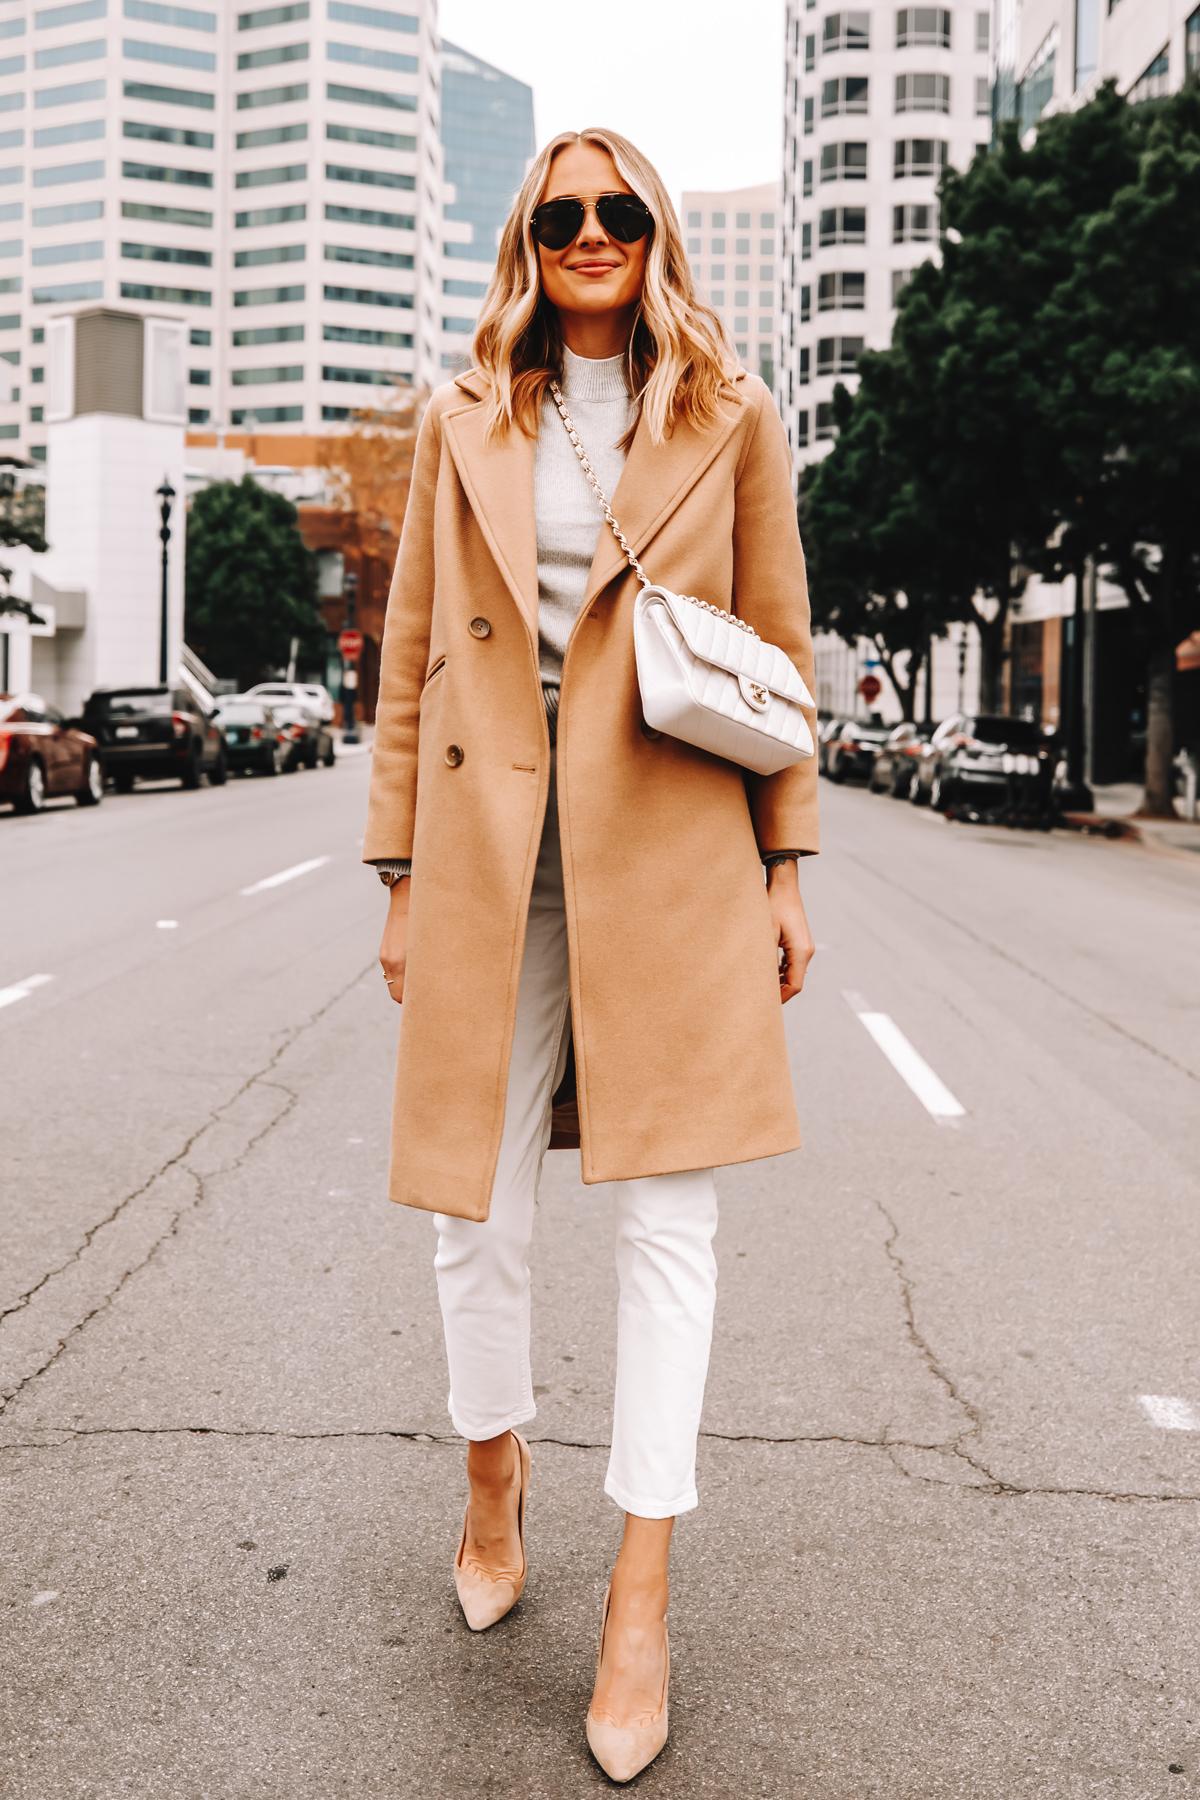 Fashion Jackson Wearing Everlane Camel Coat Grey Sweater White Jeans Nude Pumps White Chanel Handbag